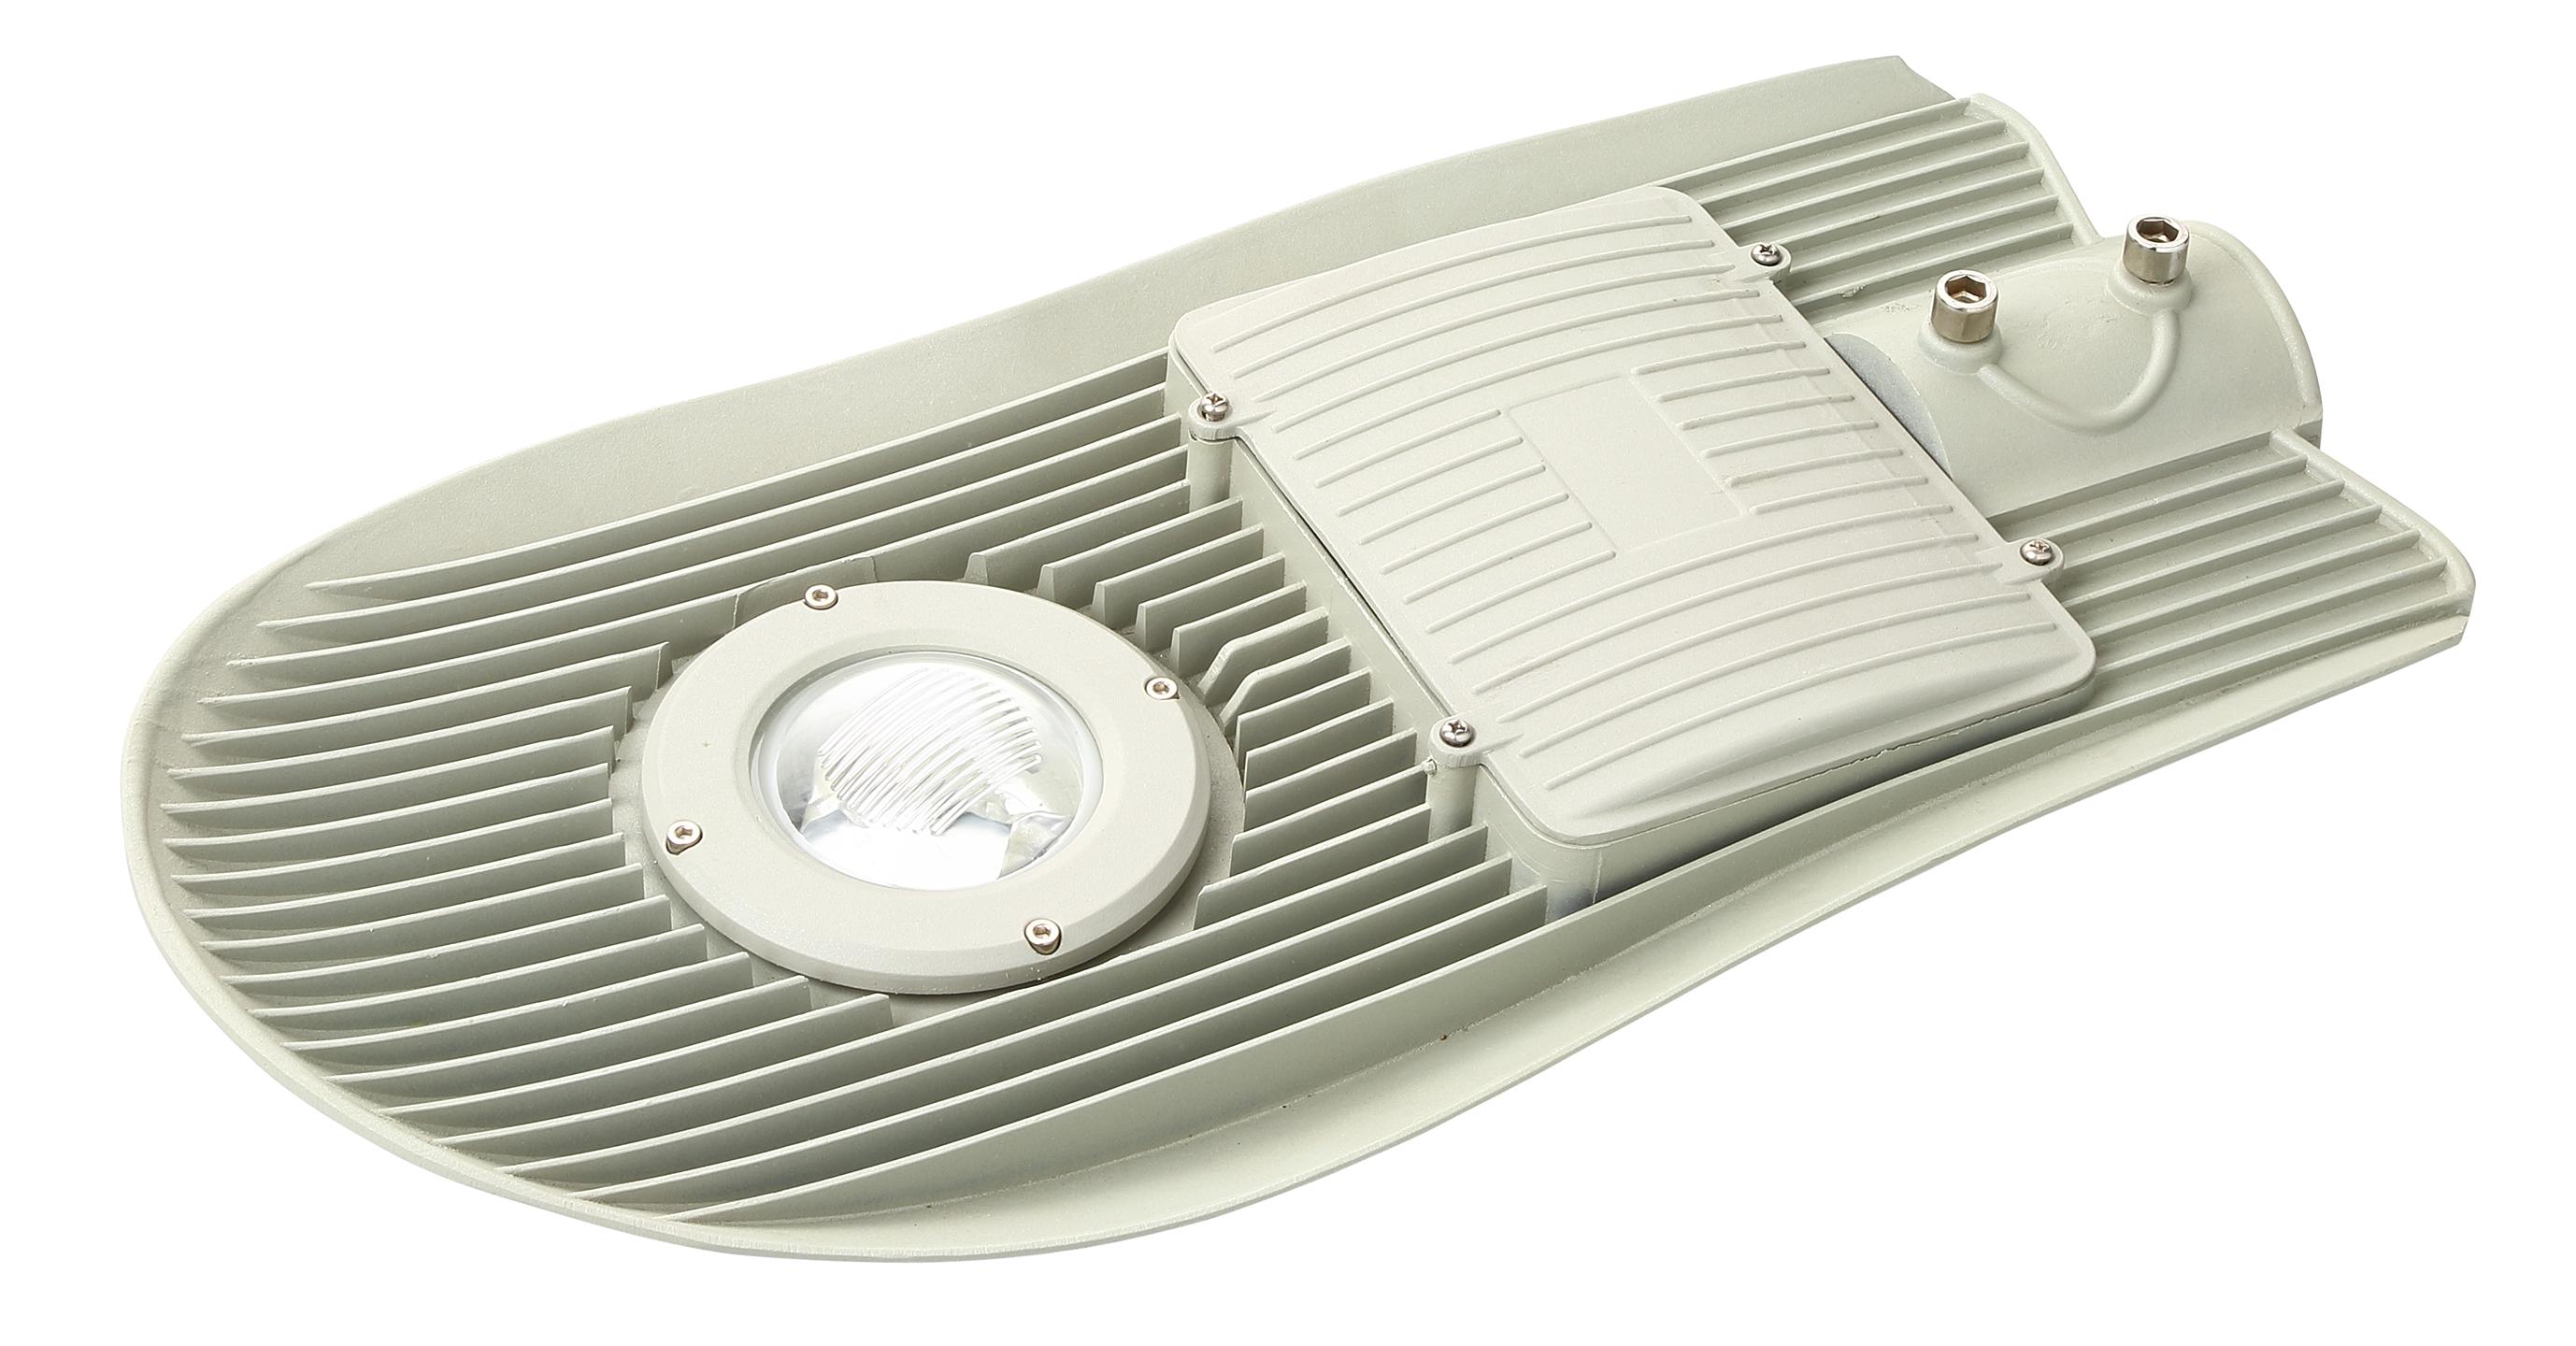 100W Waterproof IP65 Rating Aluminum Shell Tennis racket